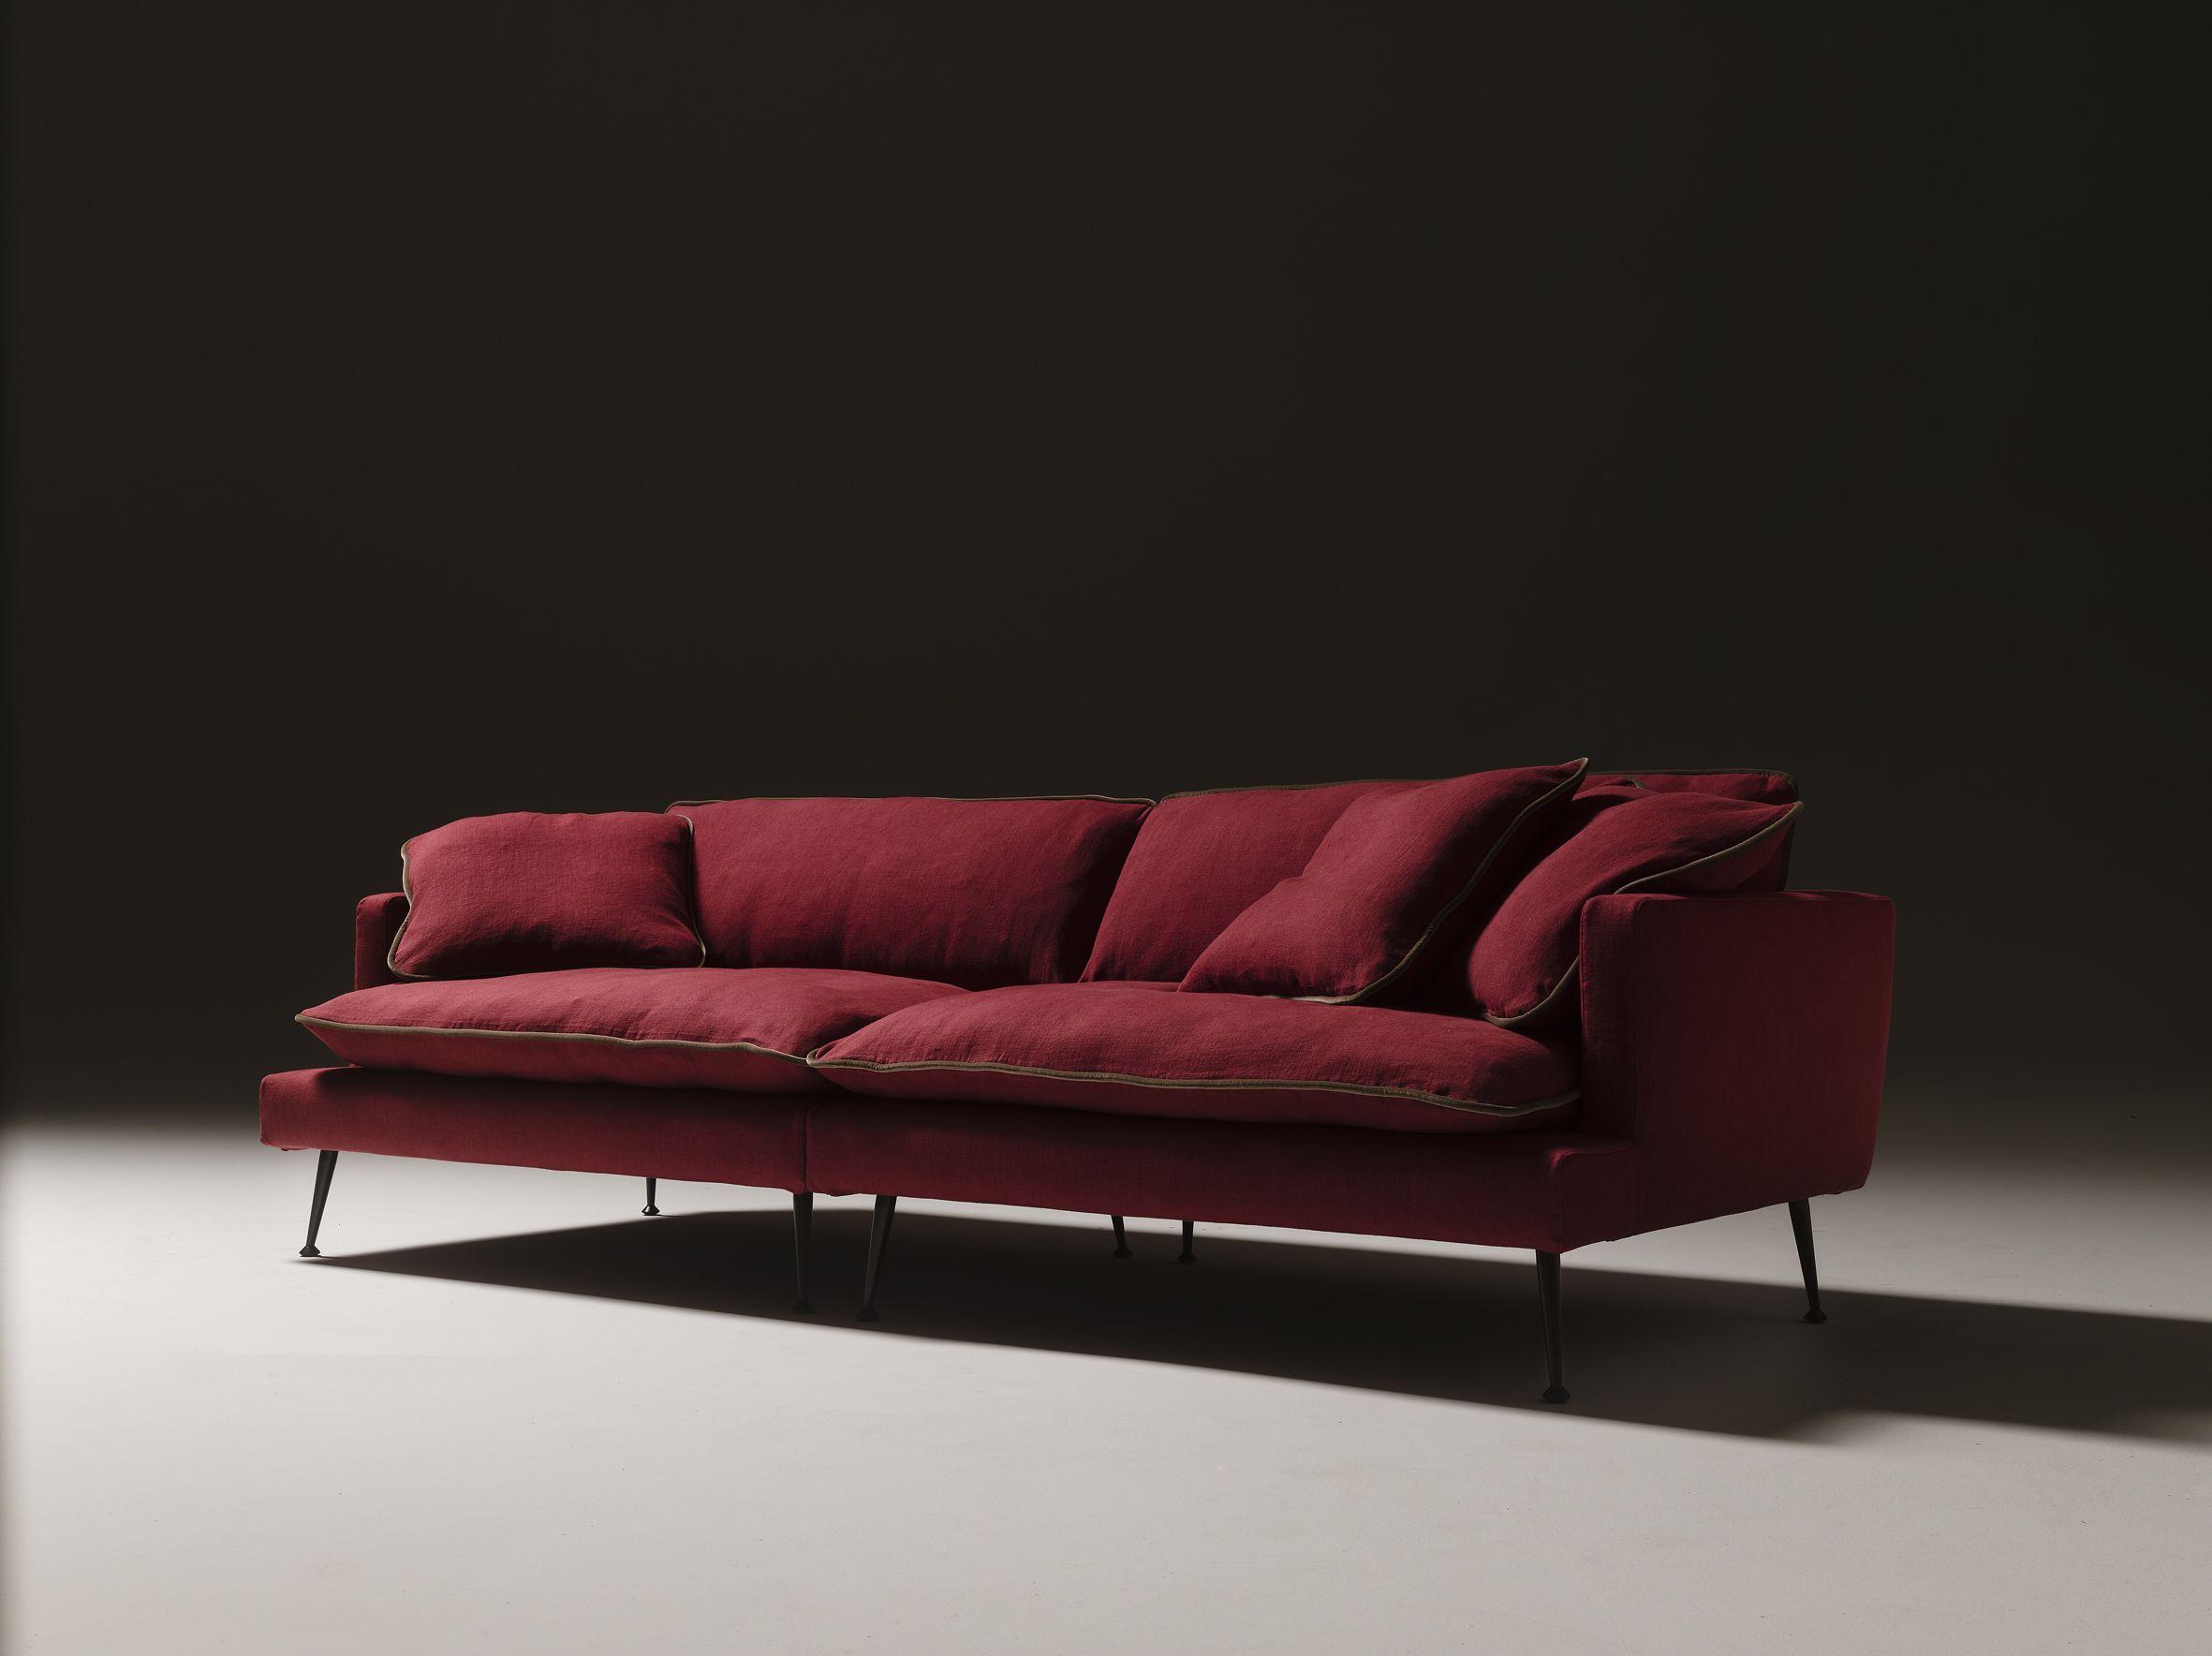 BLACKTIE  Island sofa - H&H Dubai   Sofa, Furniture, Sofa ...